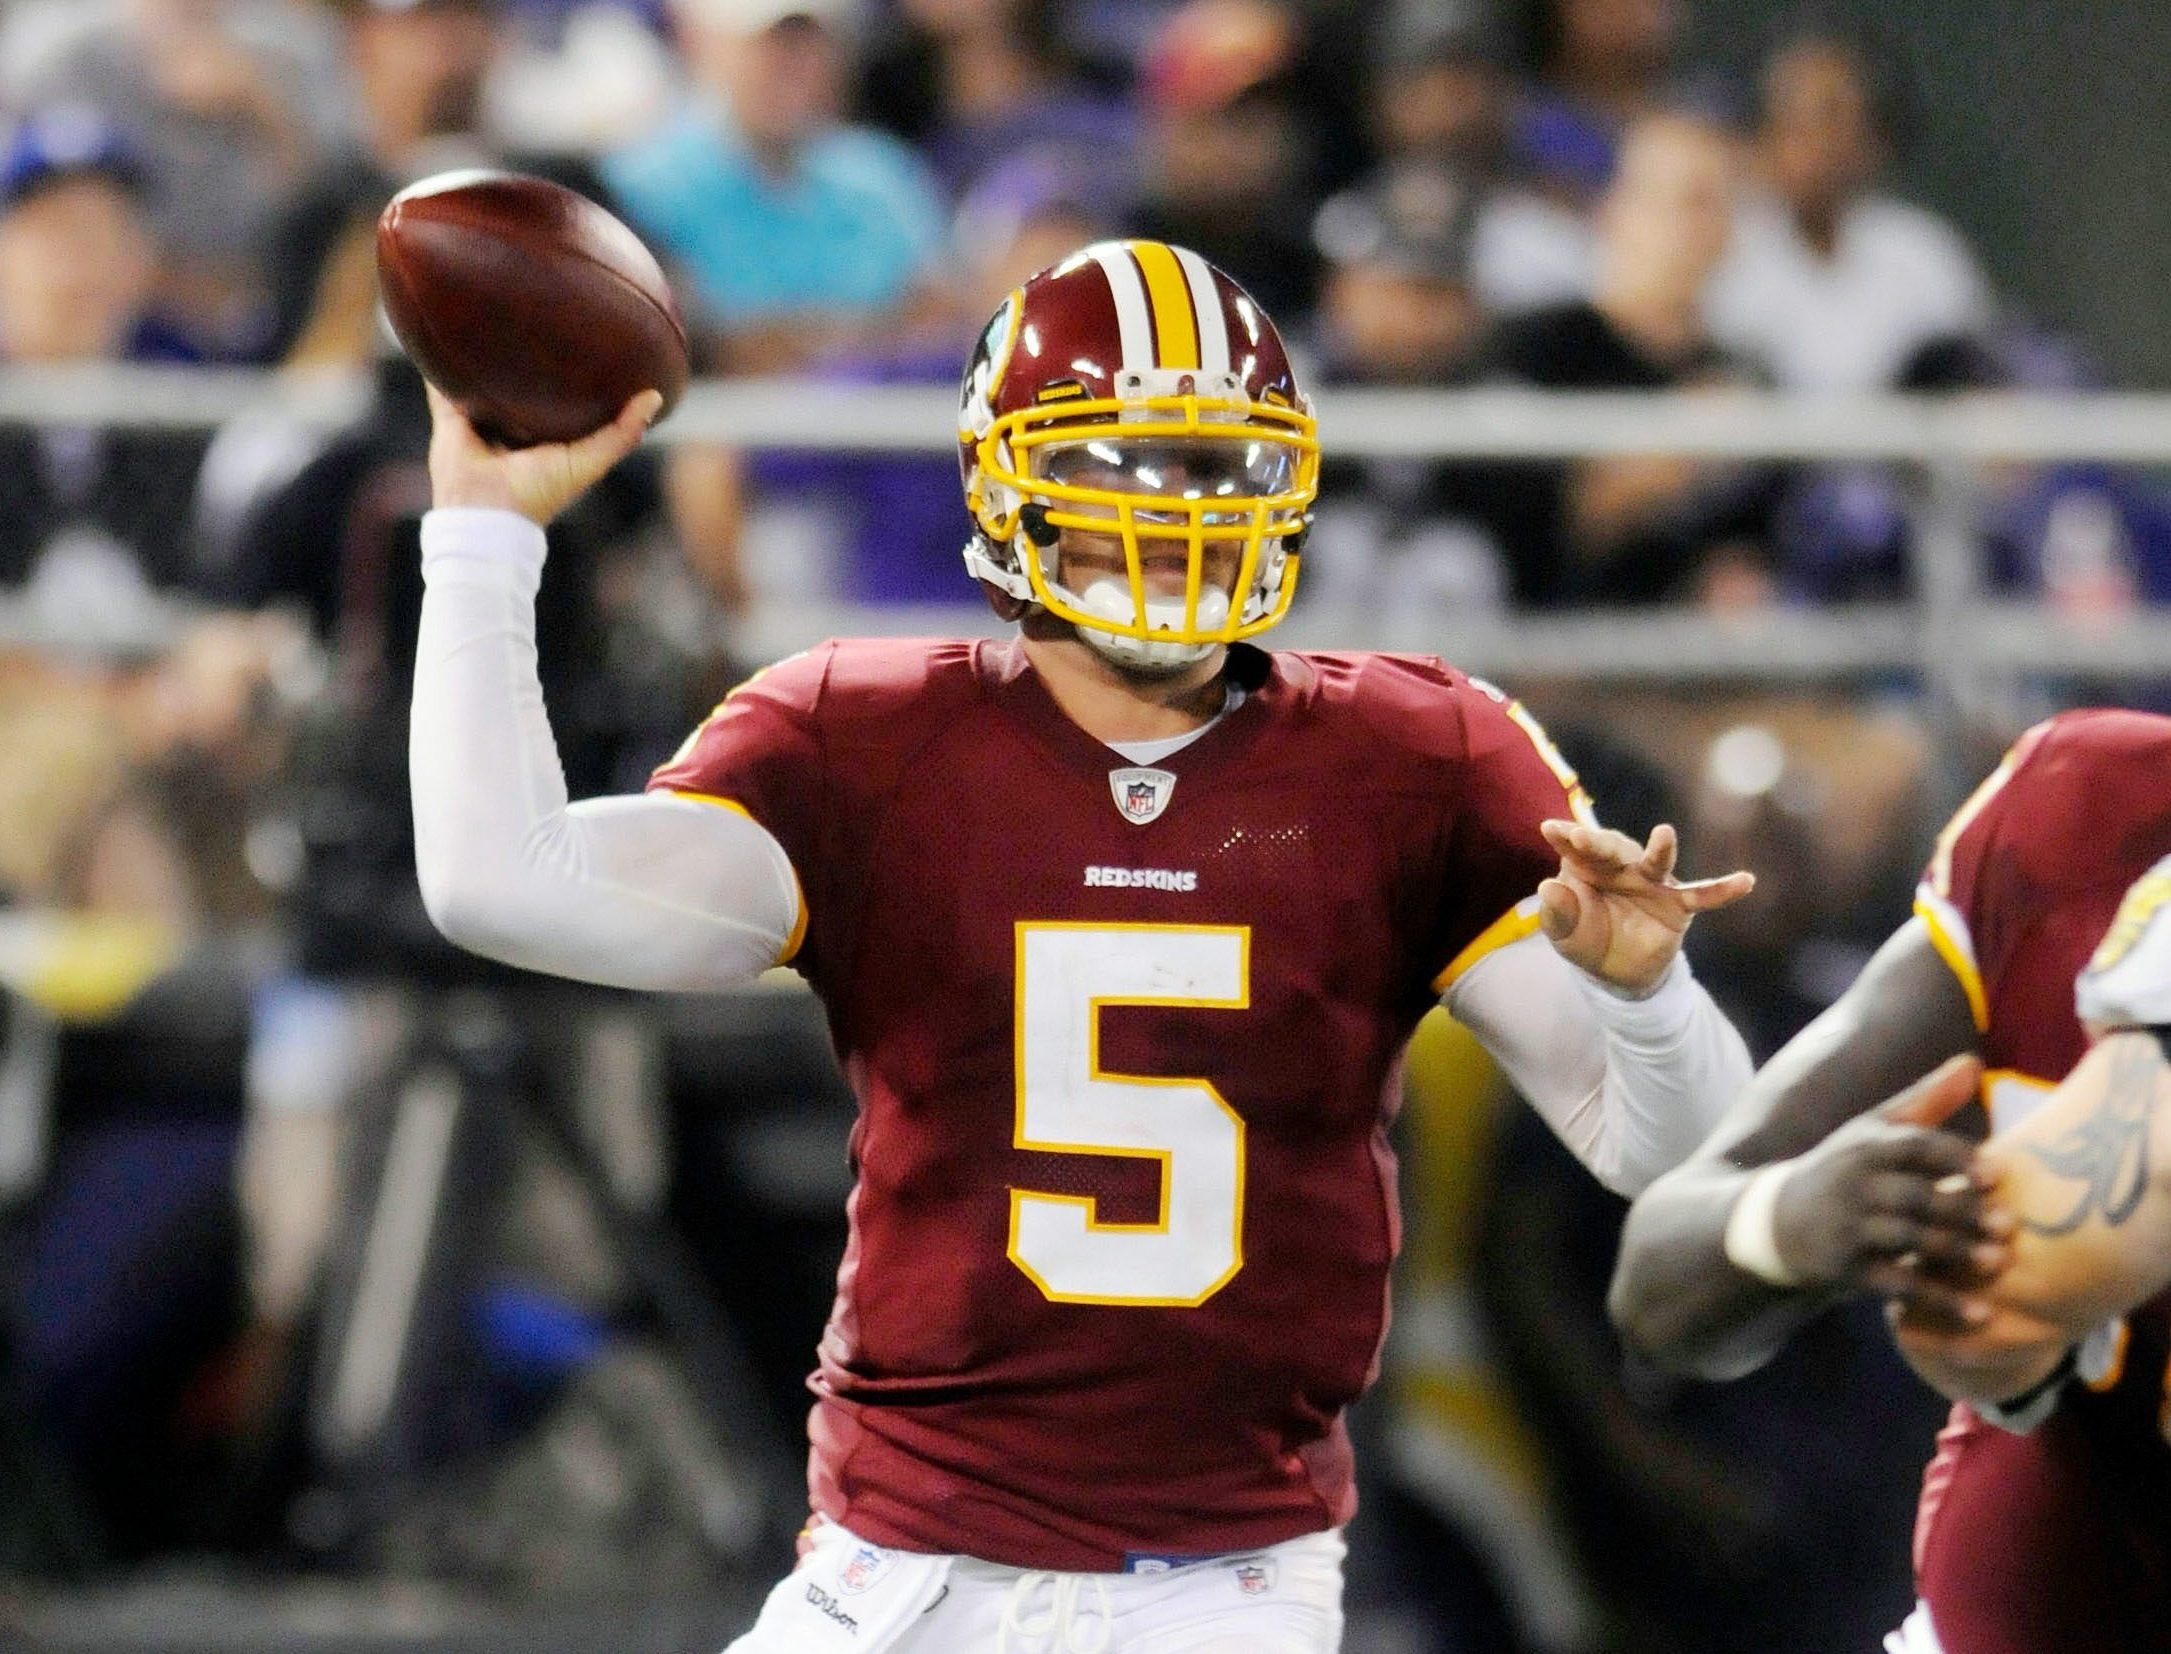 LOVERRO: Colt Brennan offers cautionary tale over Redskins' preseason hype  - Washington Times